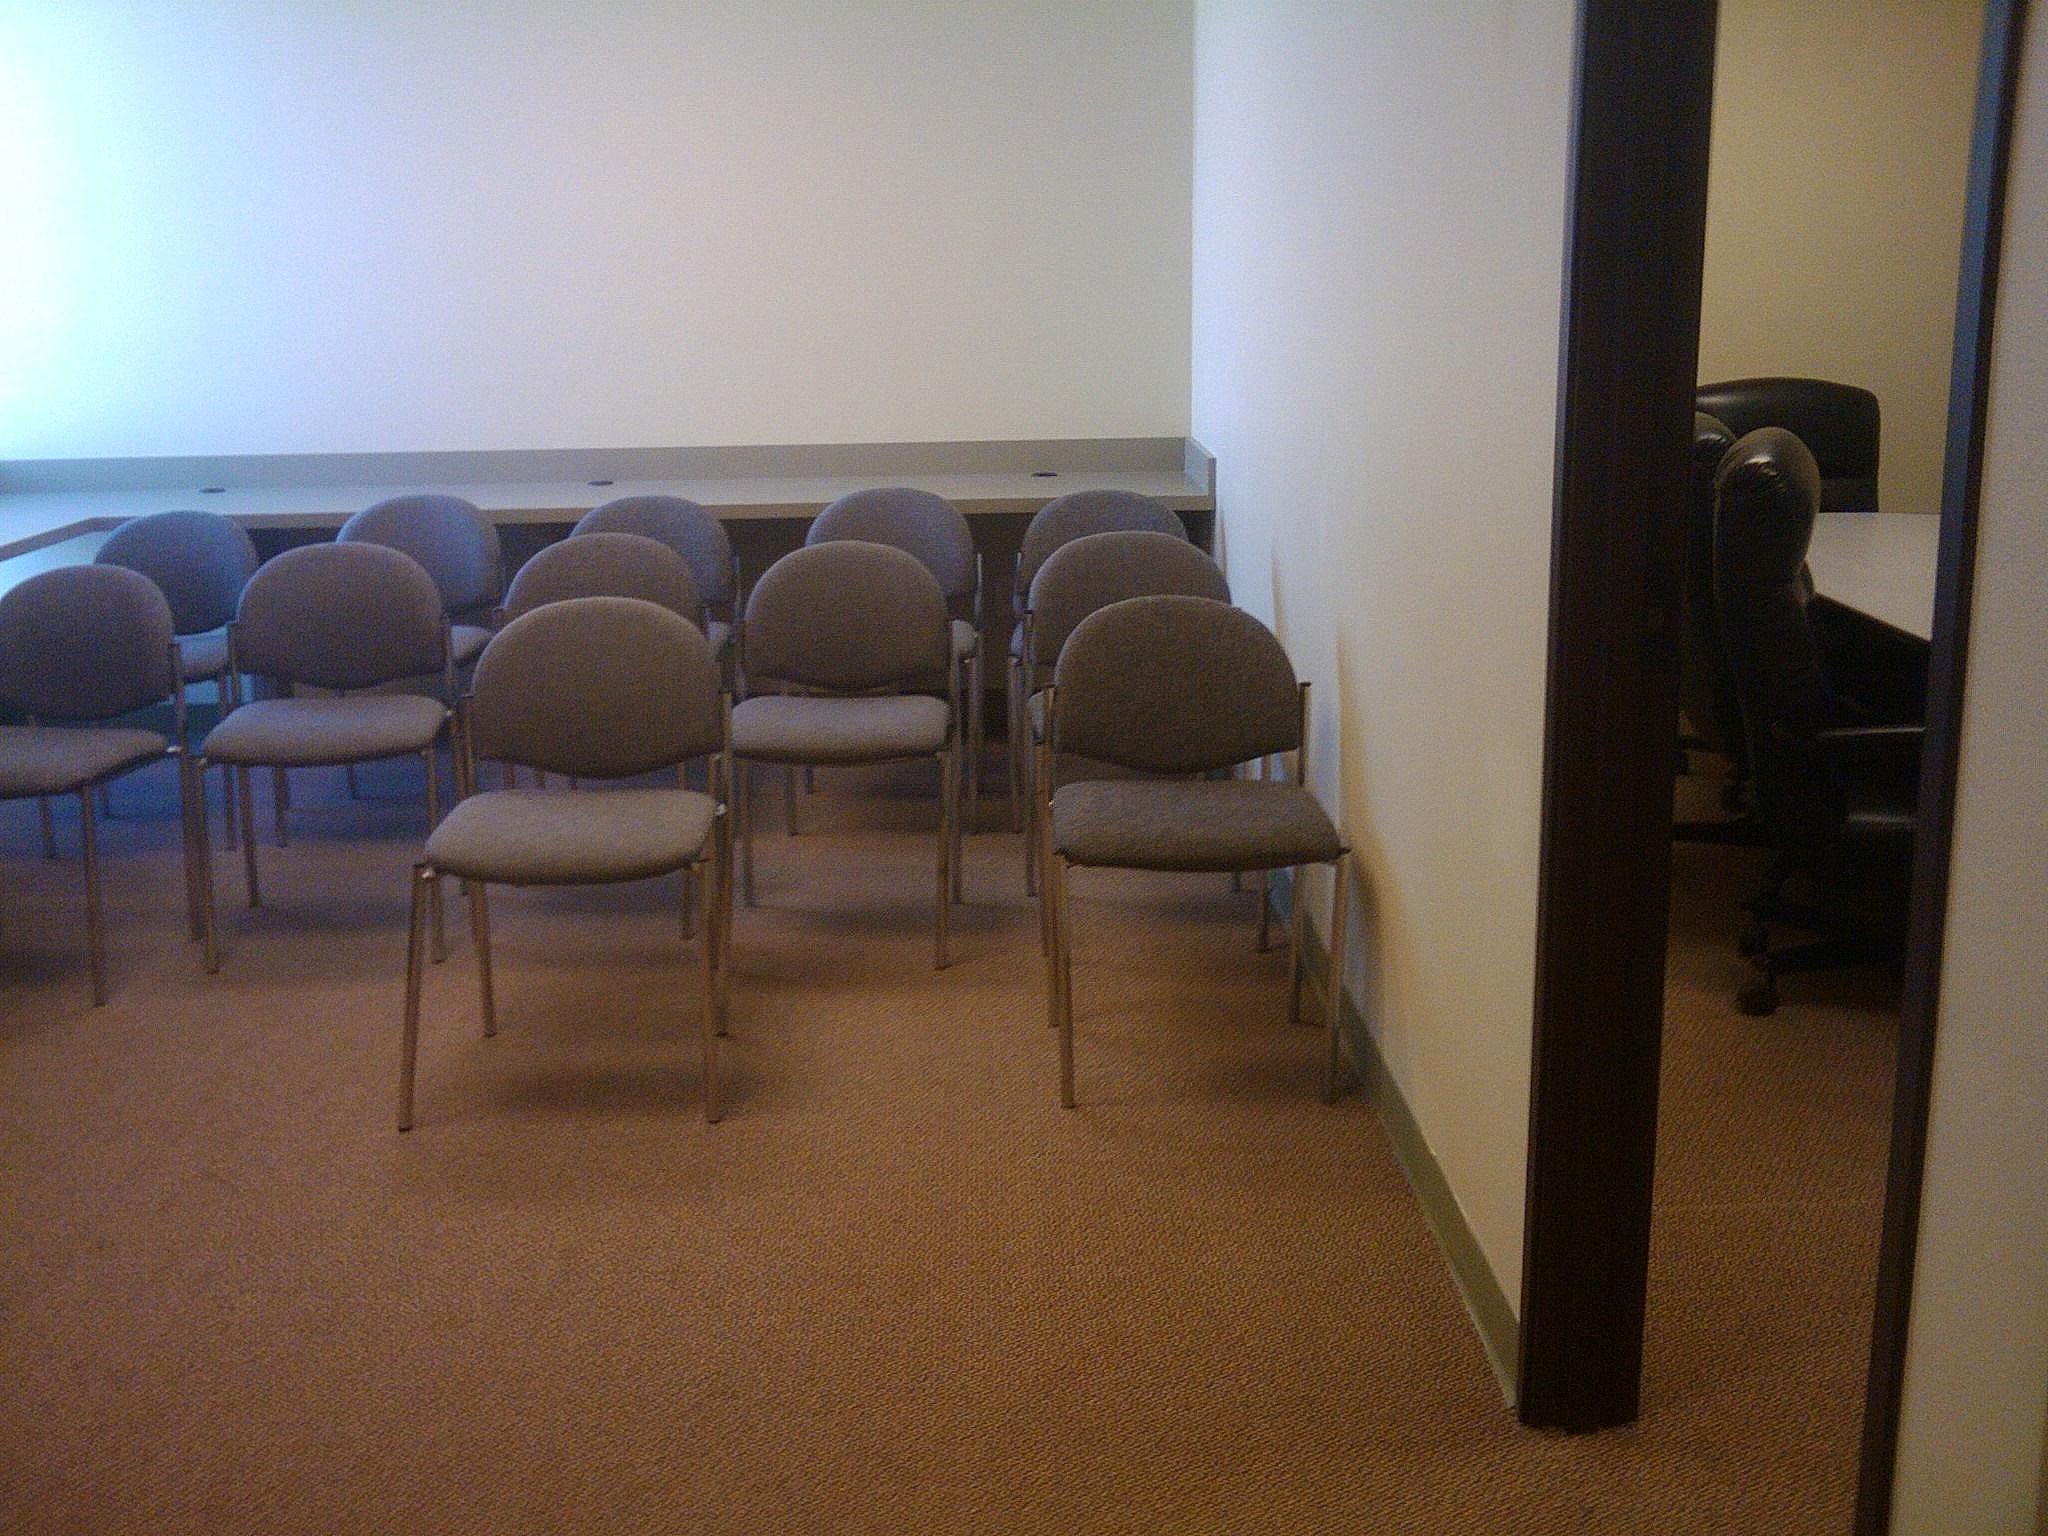 Texas Business Centers - Denton Location - Training Area / Larger Meeting Area